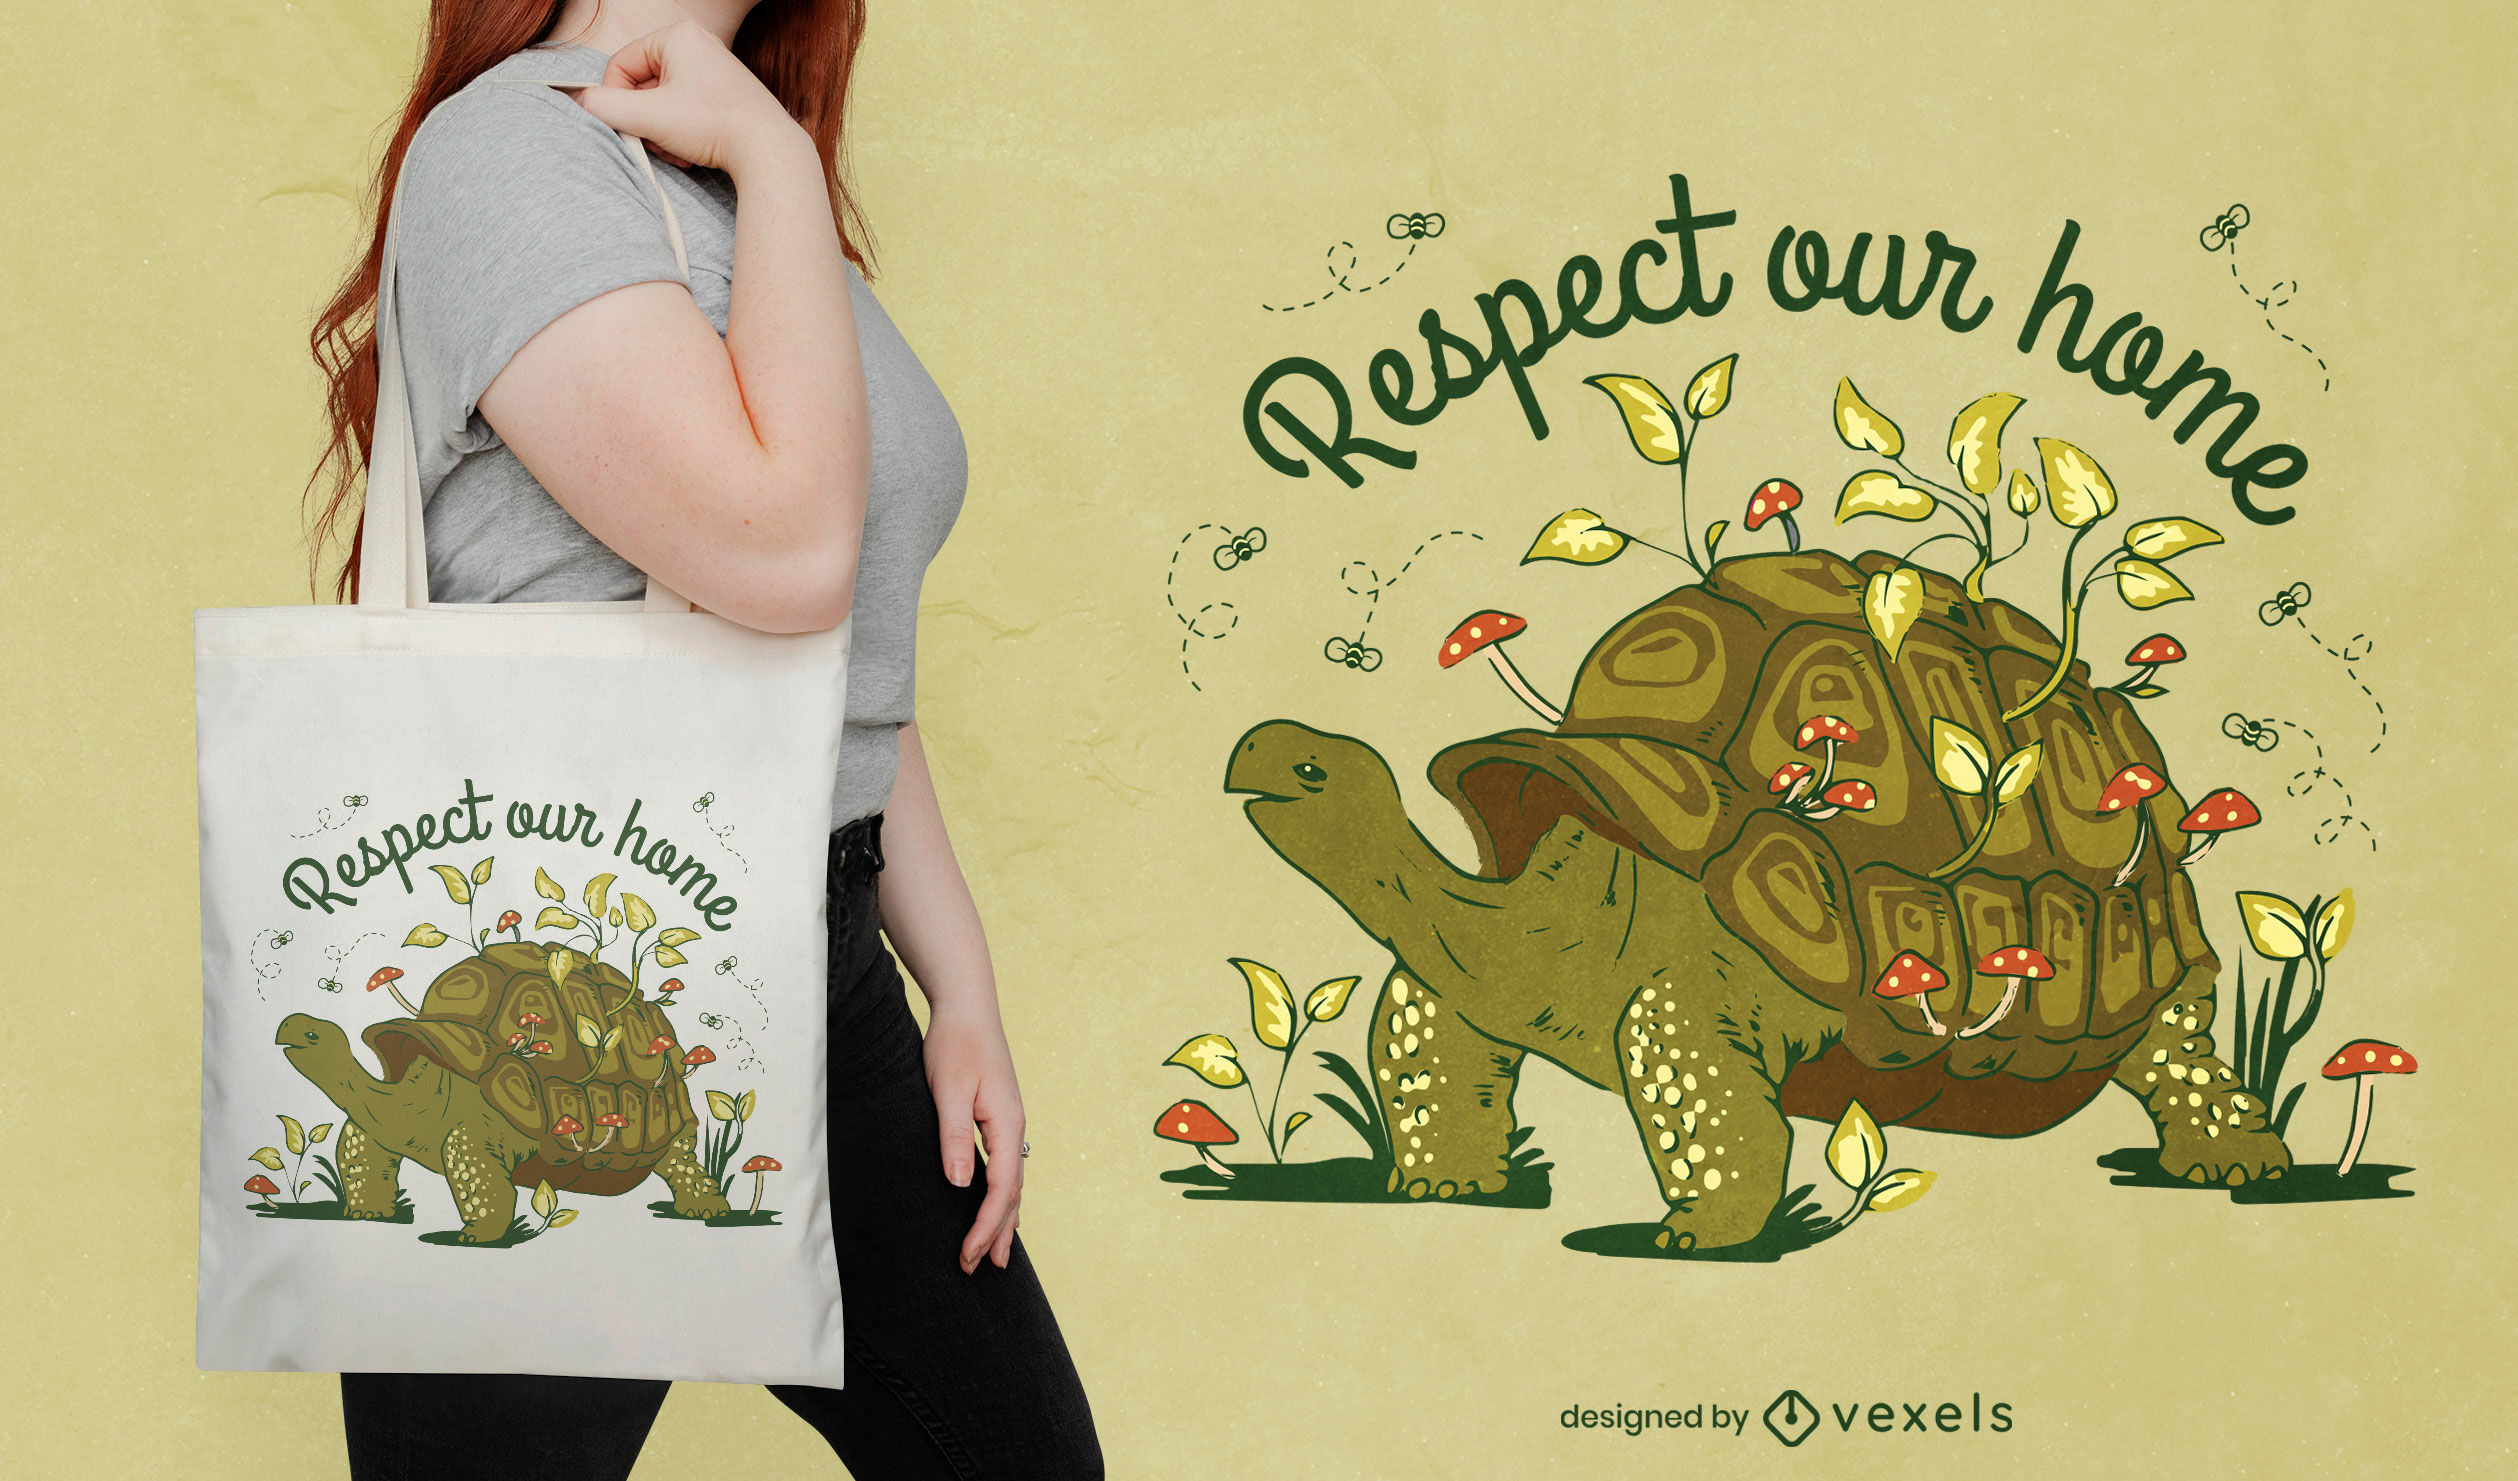 Animal de tortuga terrestre en la naturaleza dise?o de bolsa de tela